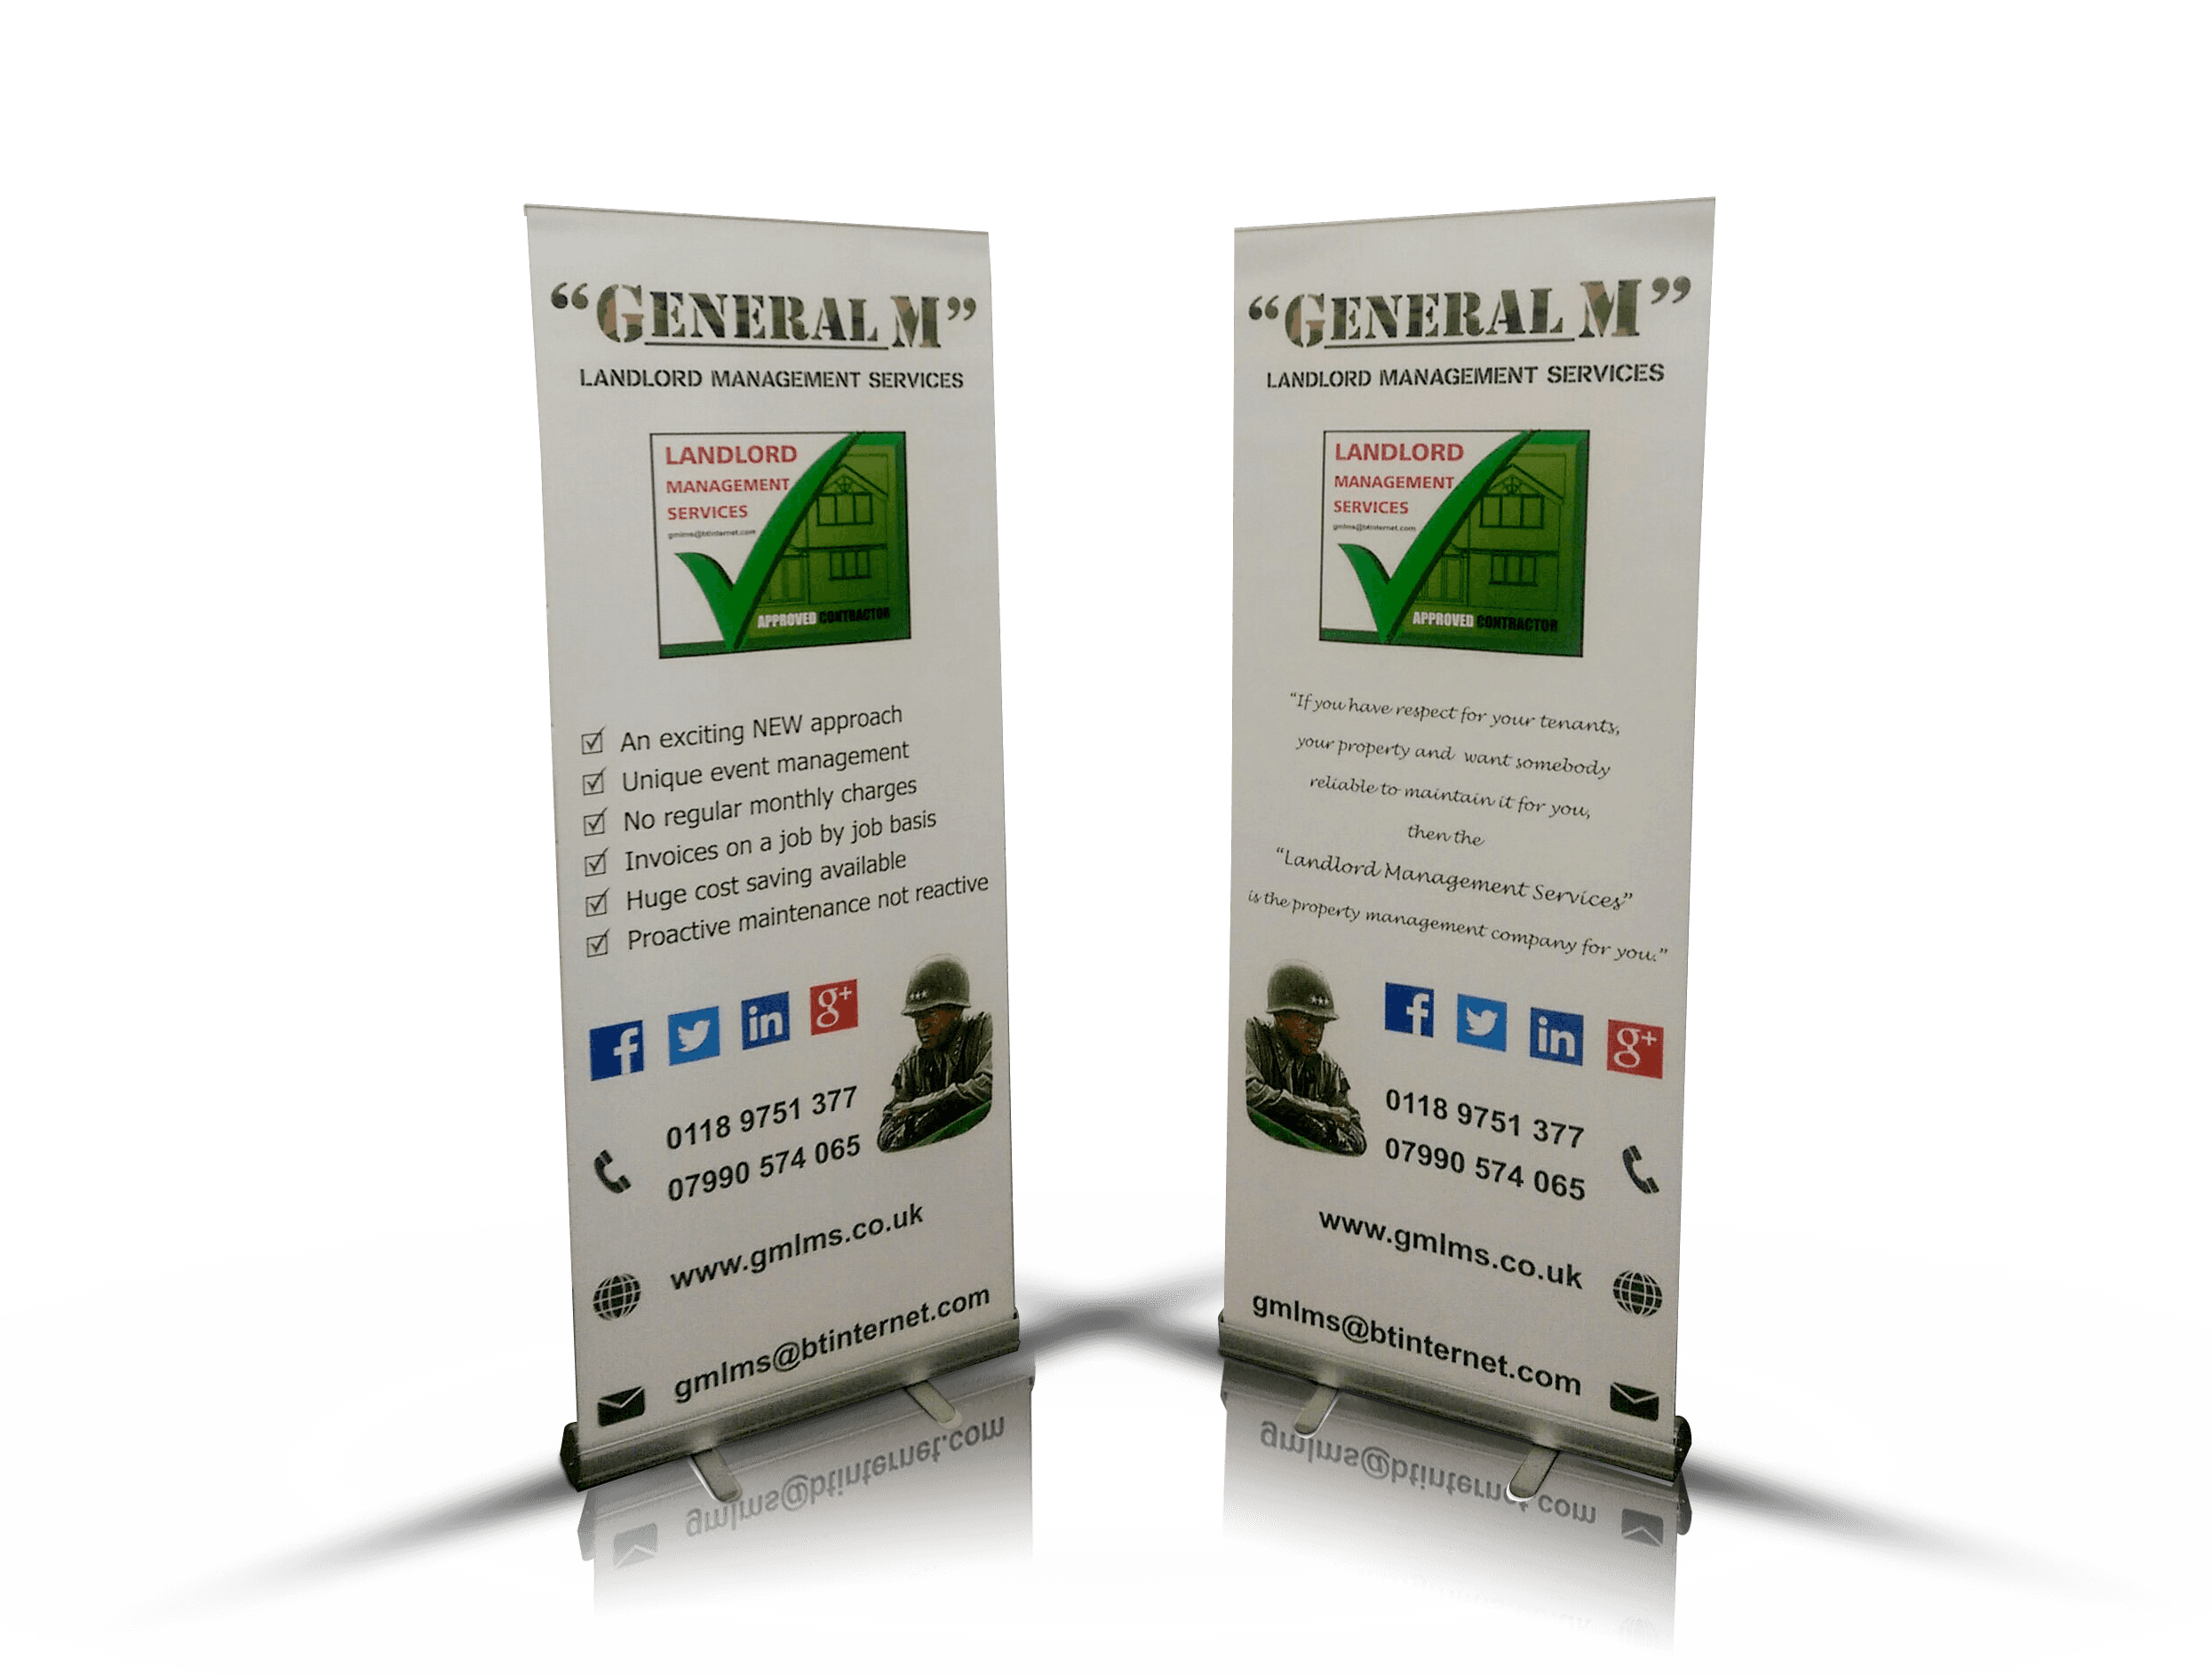 GENERAL M PVC banner